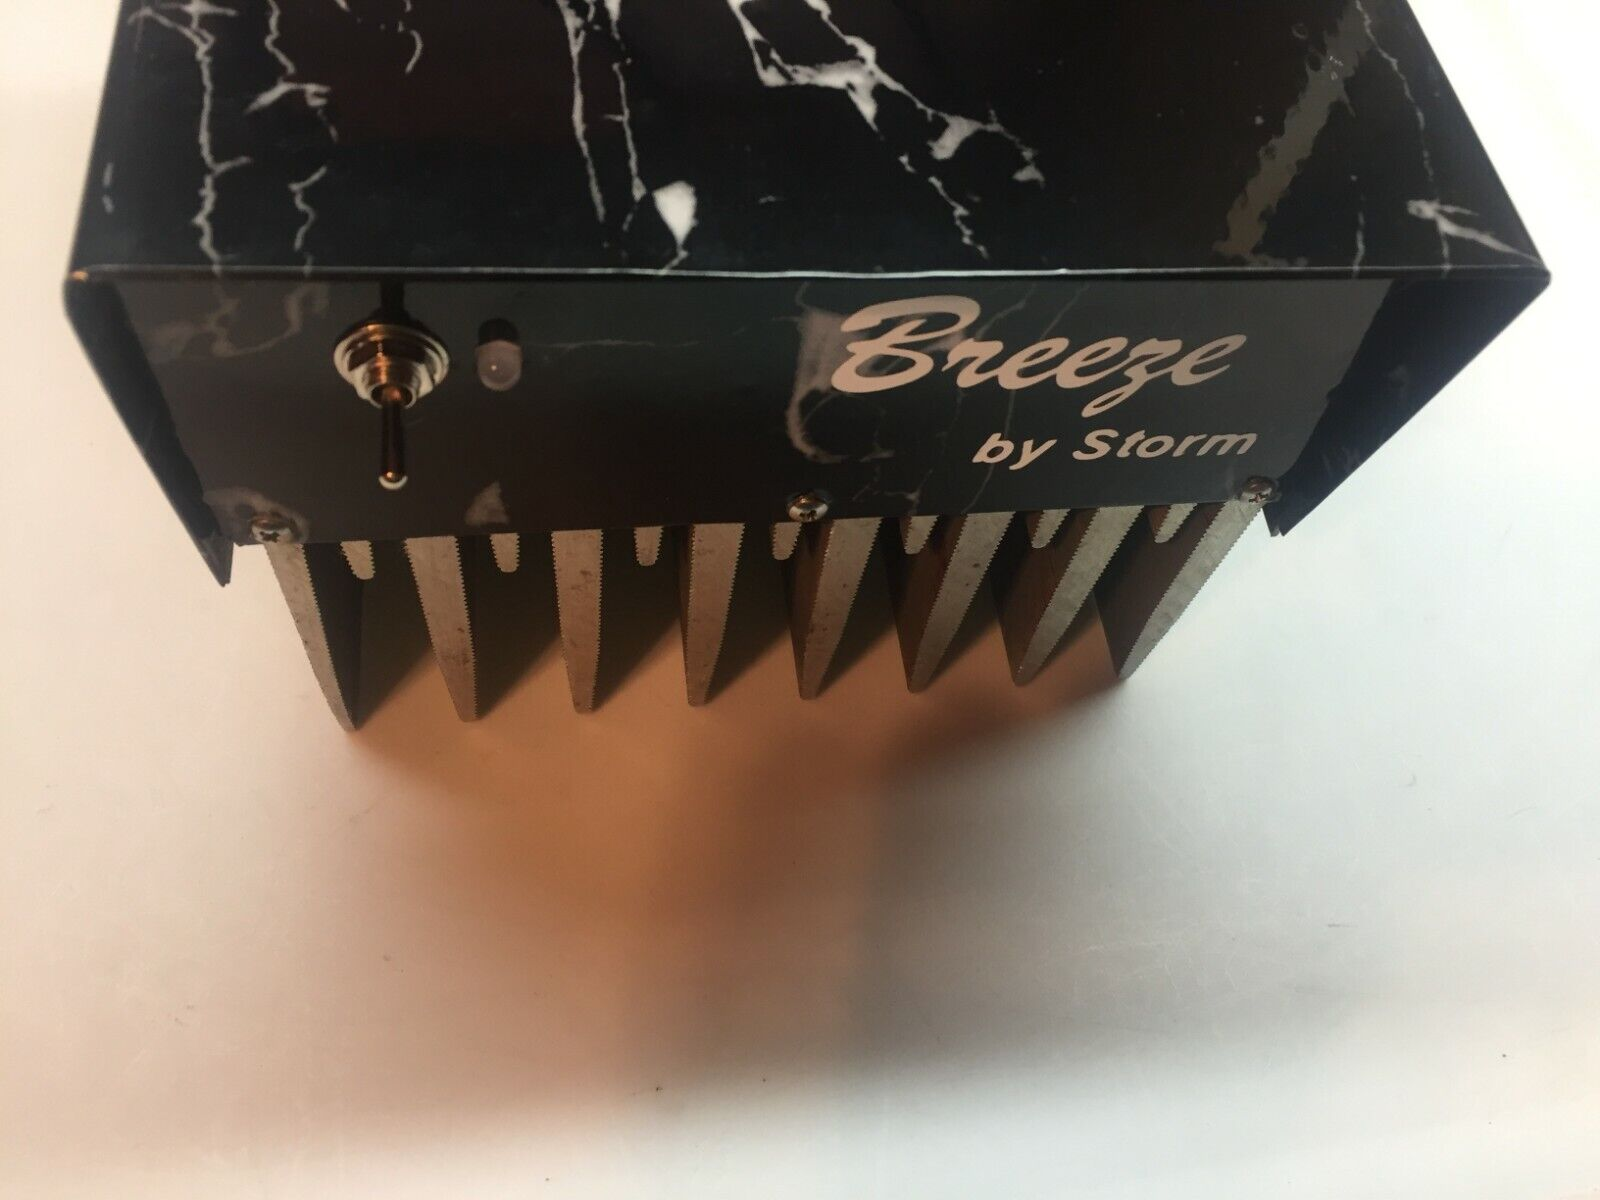 STORM BUILT 2 PILL HI DRIVE AM/FM AMP . Available Now for 248.98